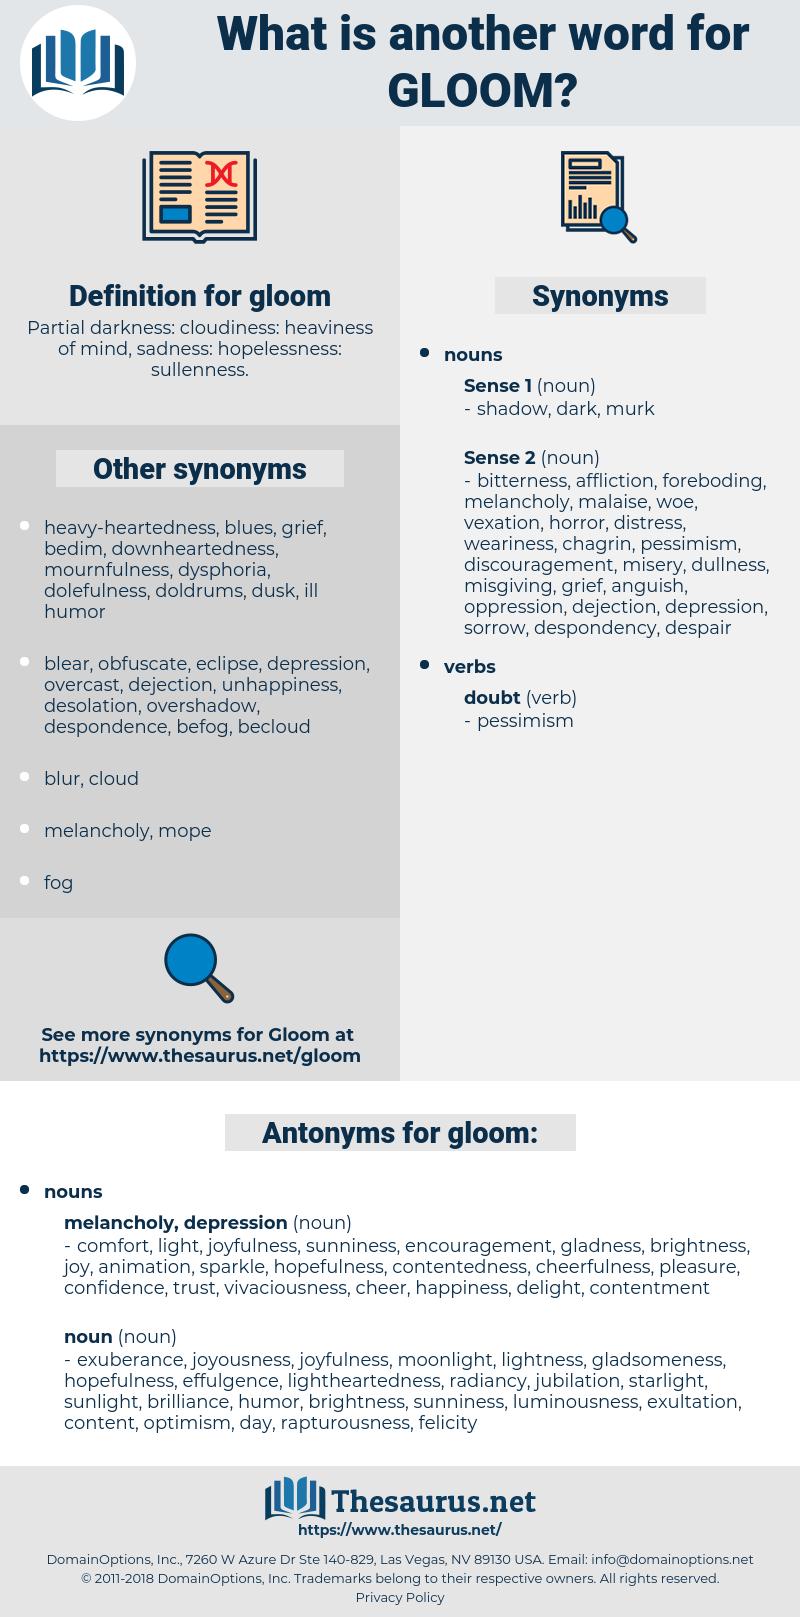 gloom, synonym gloom, another word for gloom, words like gloom, thesaurus gloom